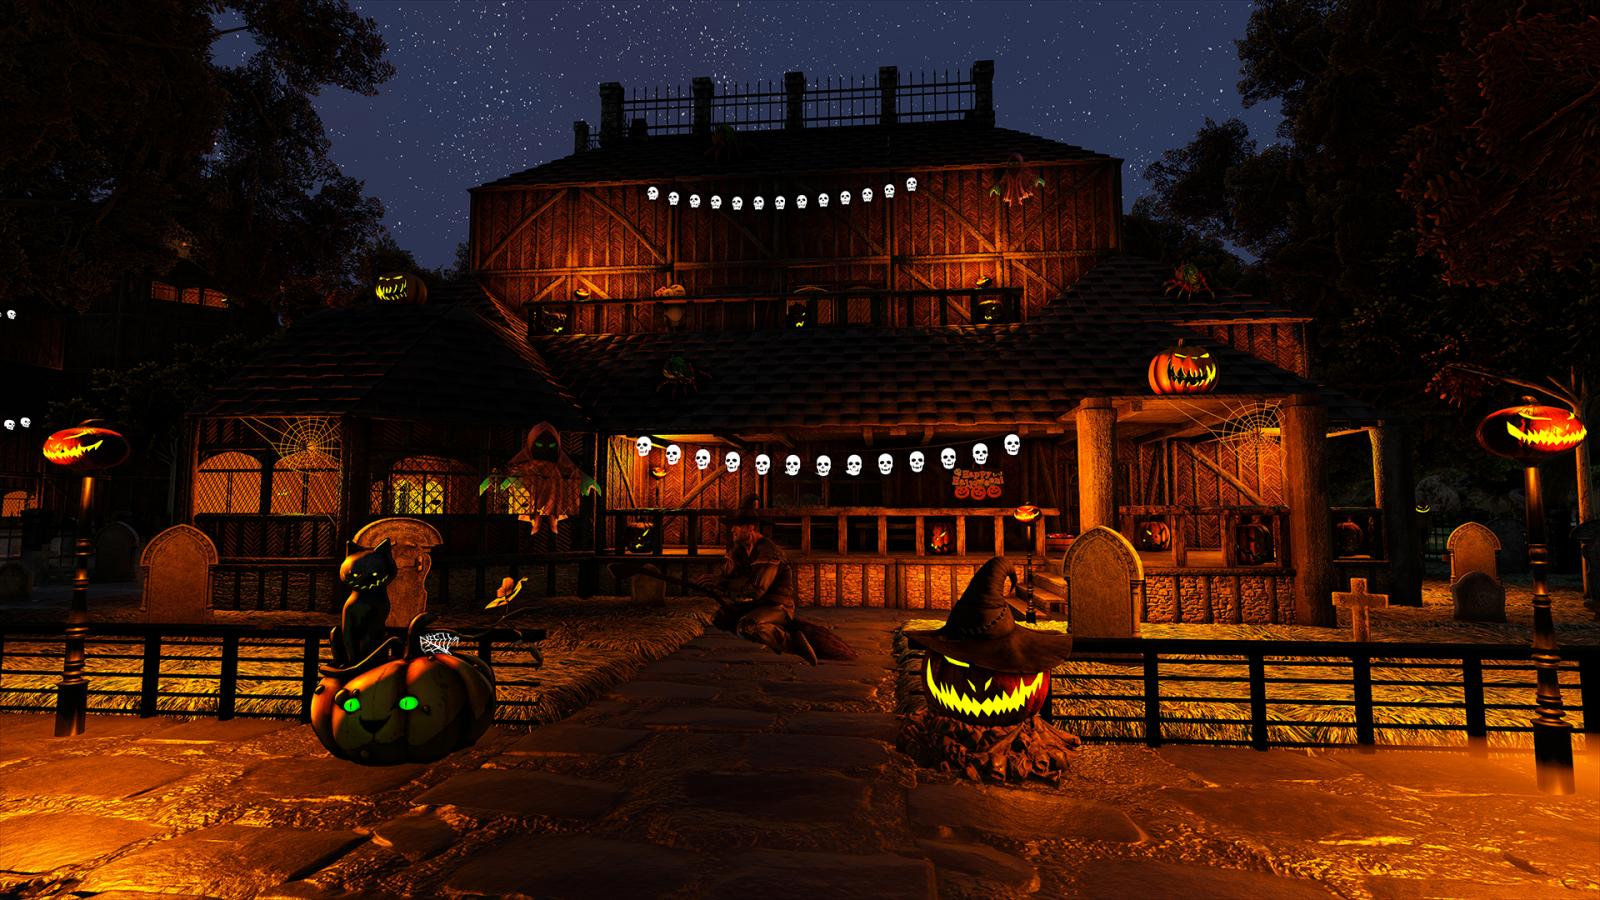 large.59f3d6b929204_WolfAngelus-HalloweenTownHouse(2)Night-8x.jpg